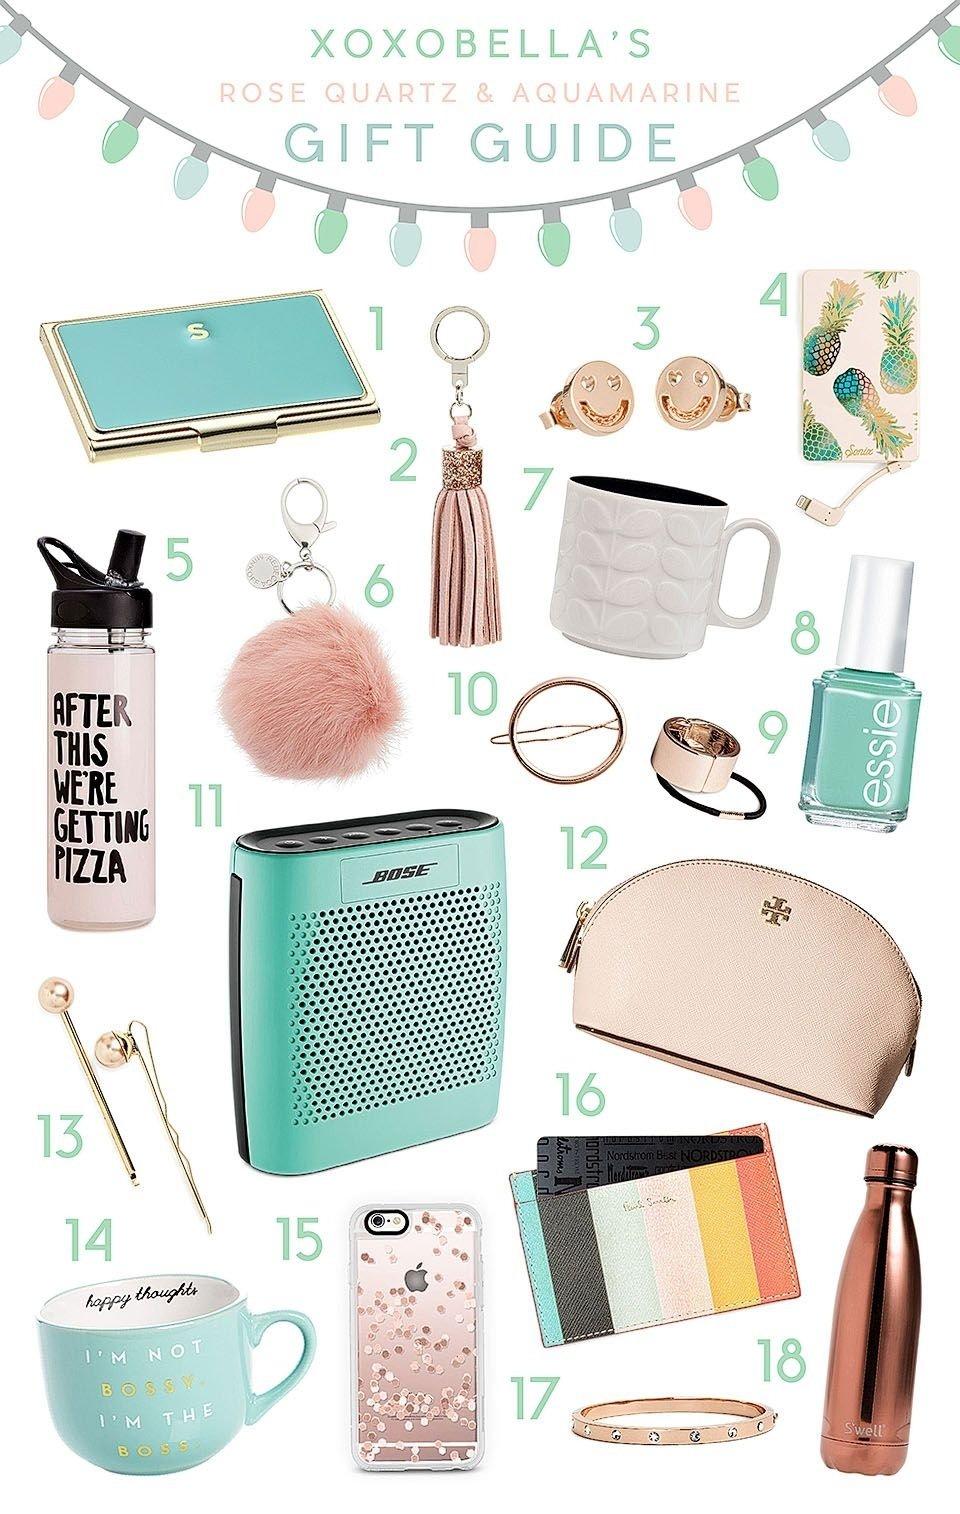 10 Spectacular Birthday Present Ideas For Teenage Girls rose quartz aquamarine gift guide holiday gift guide aqua and rose 9 2021